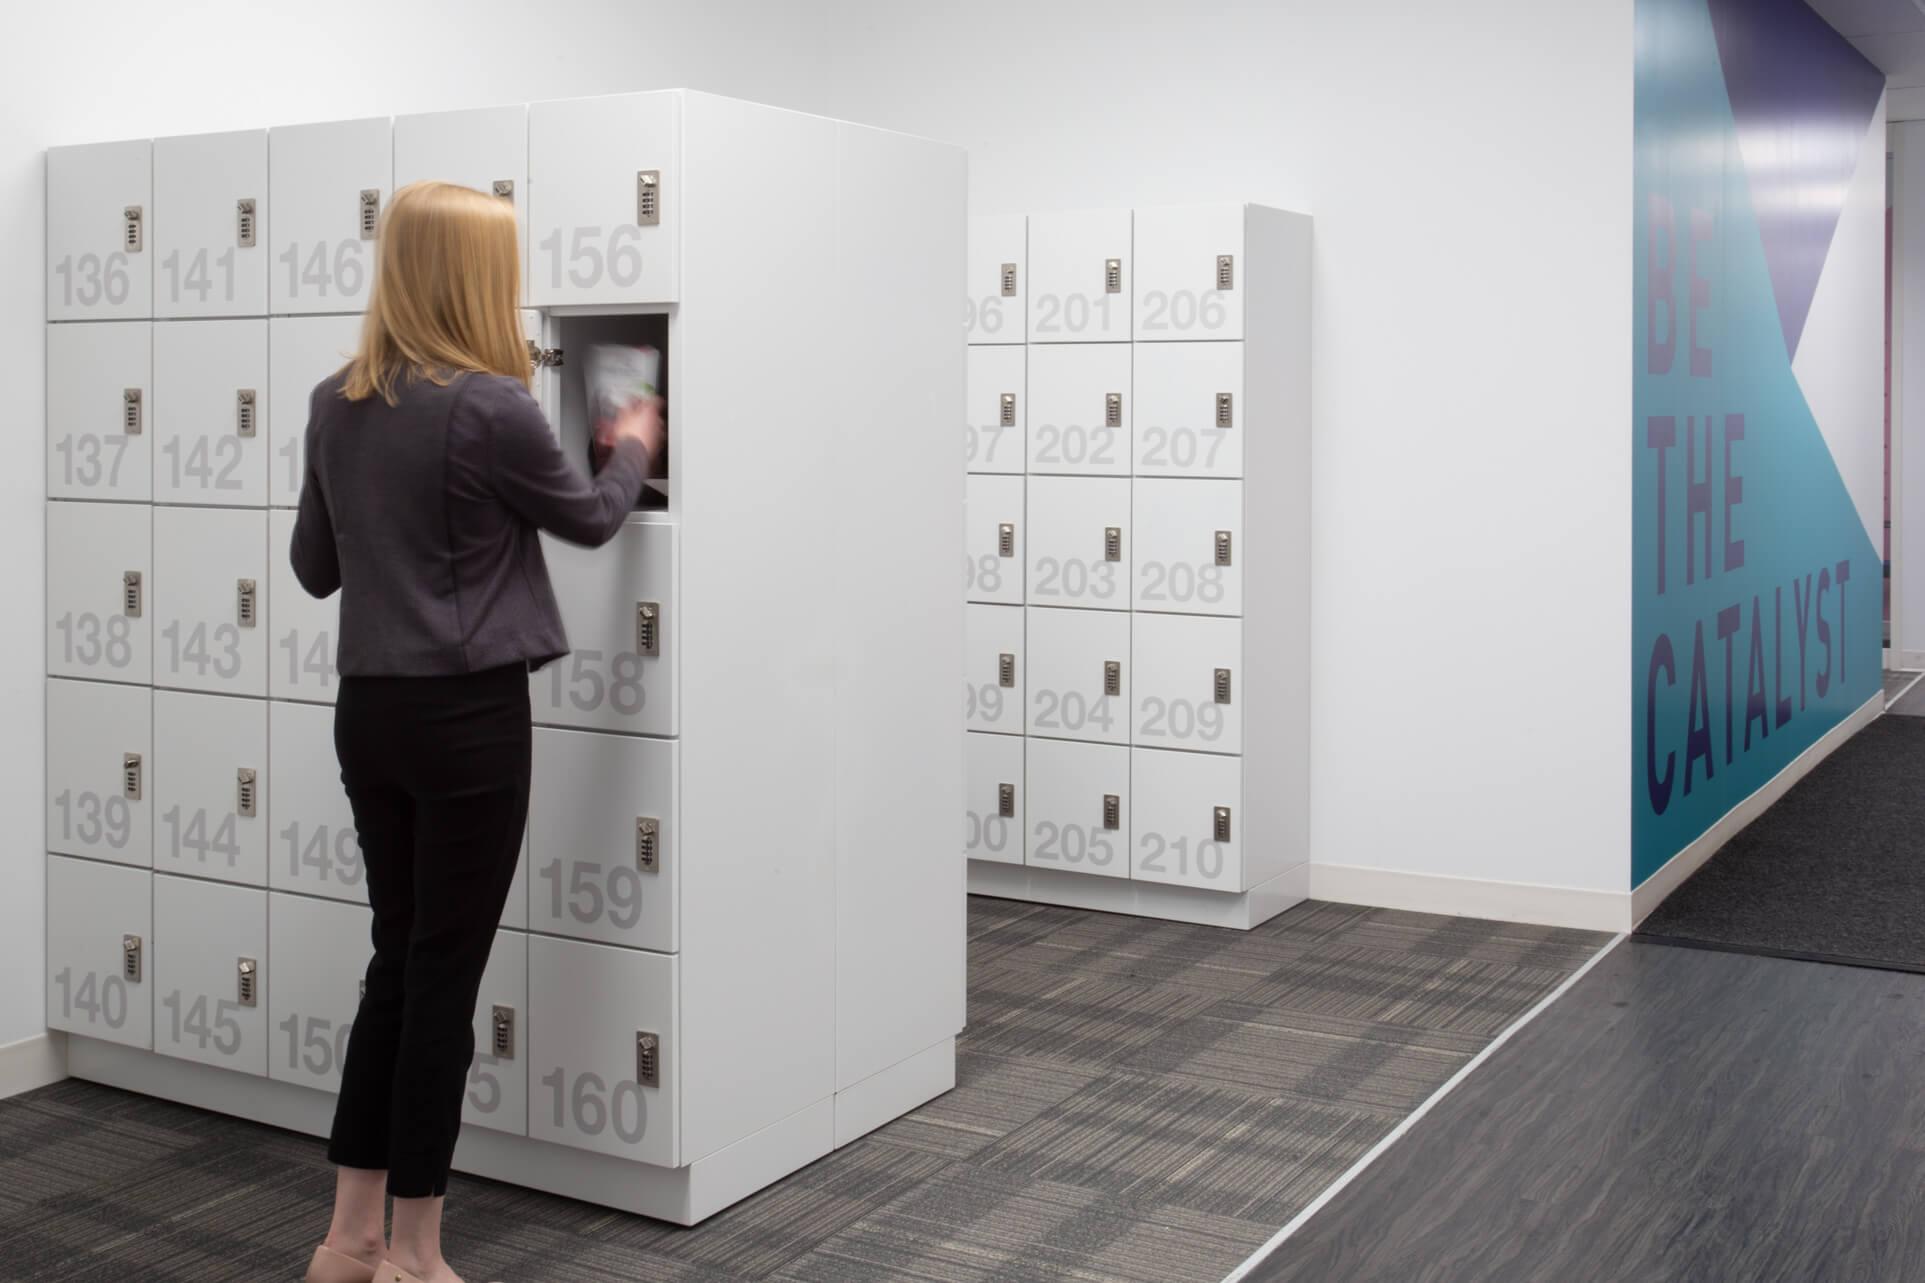 Staff Lockers at Unilever